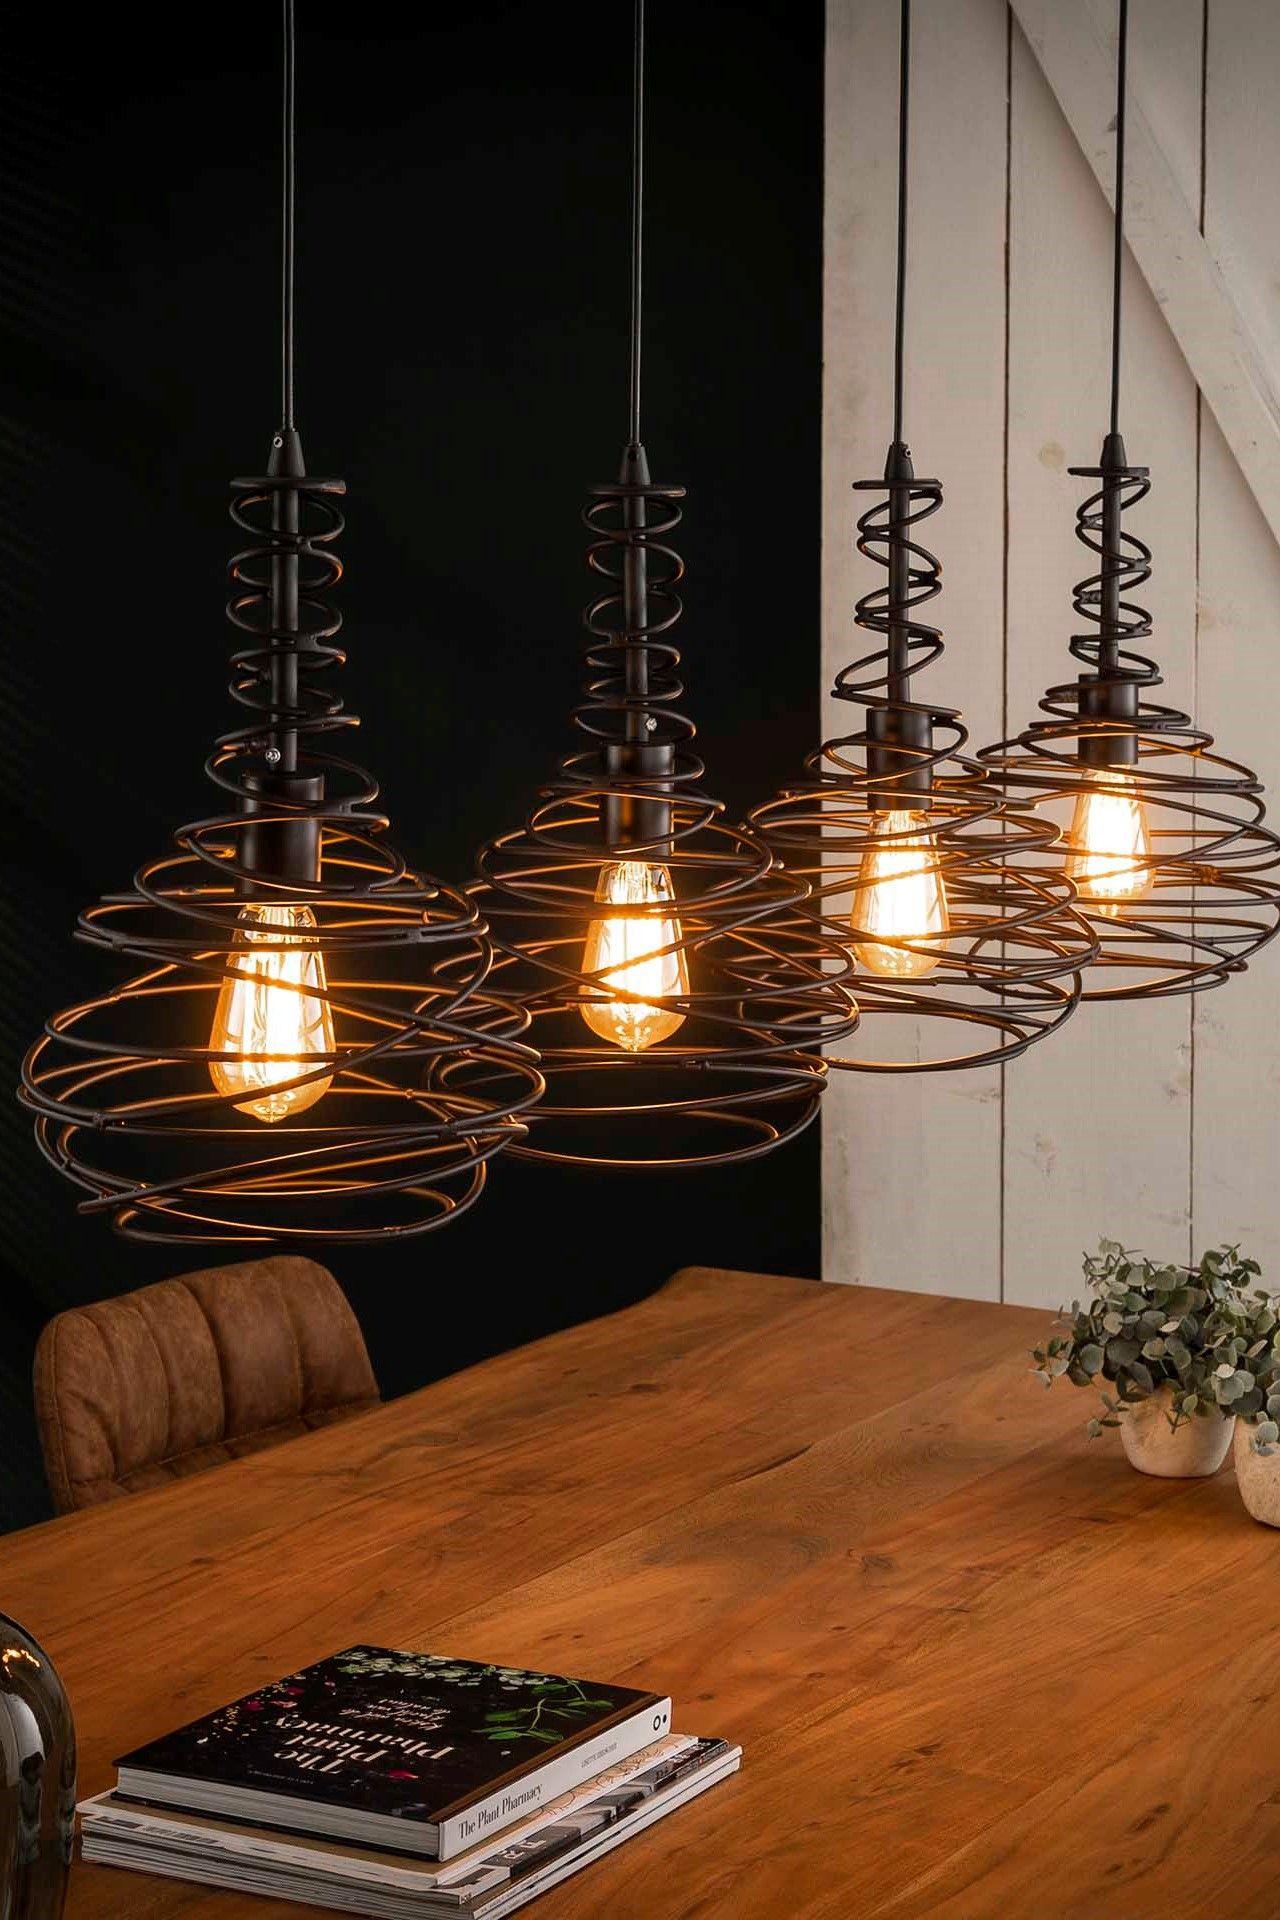 Hangelampe Spin Xl Lampe Lampen Hange Lampe